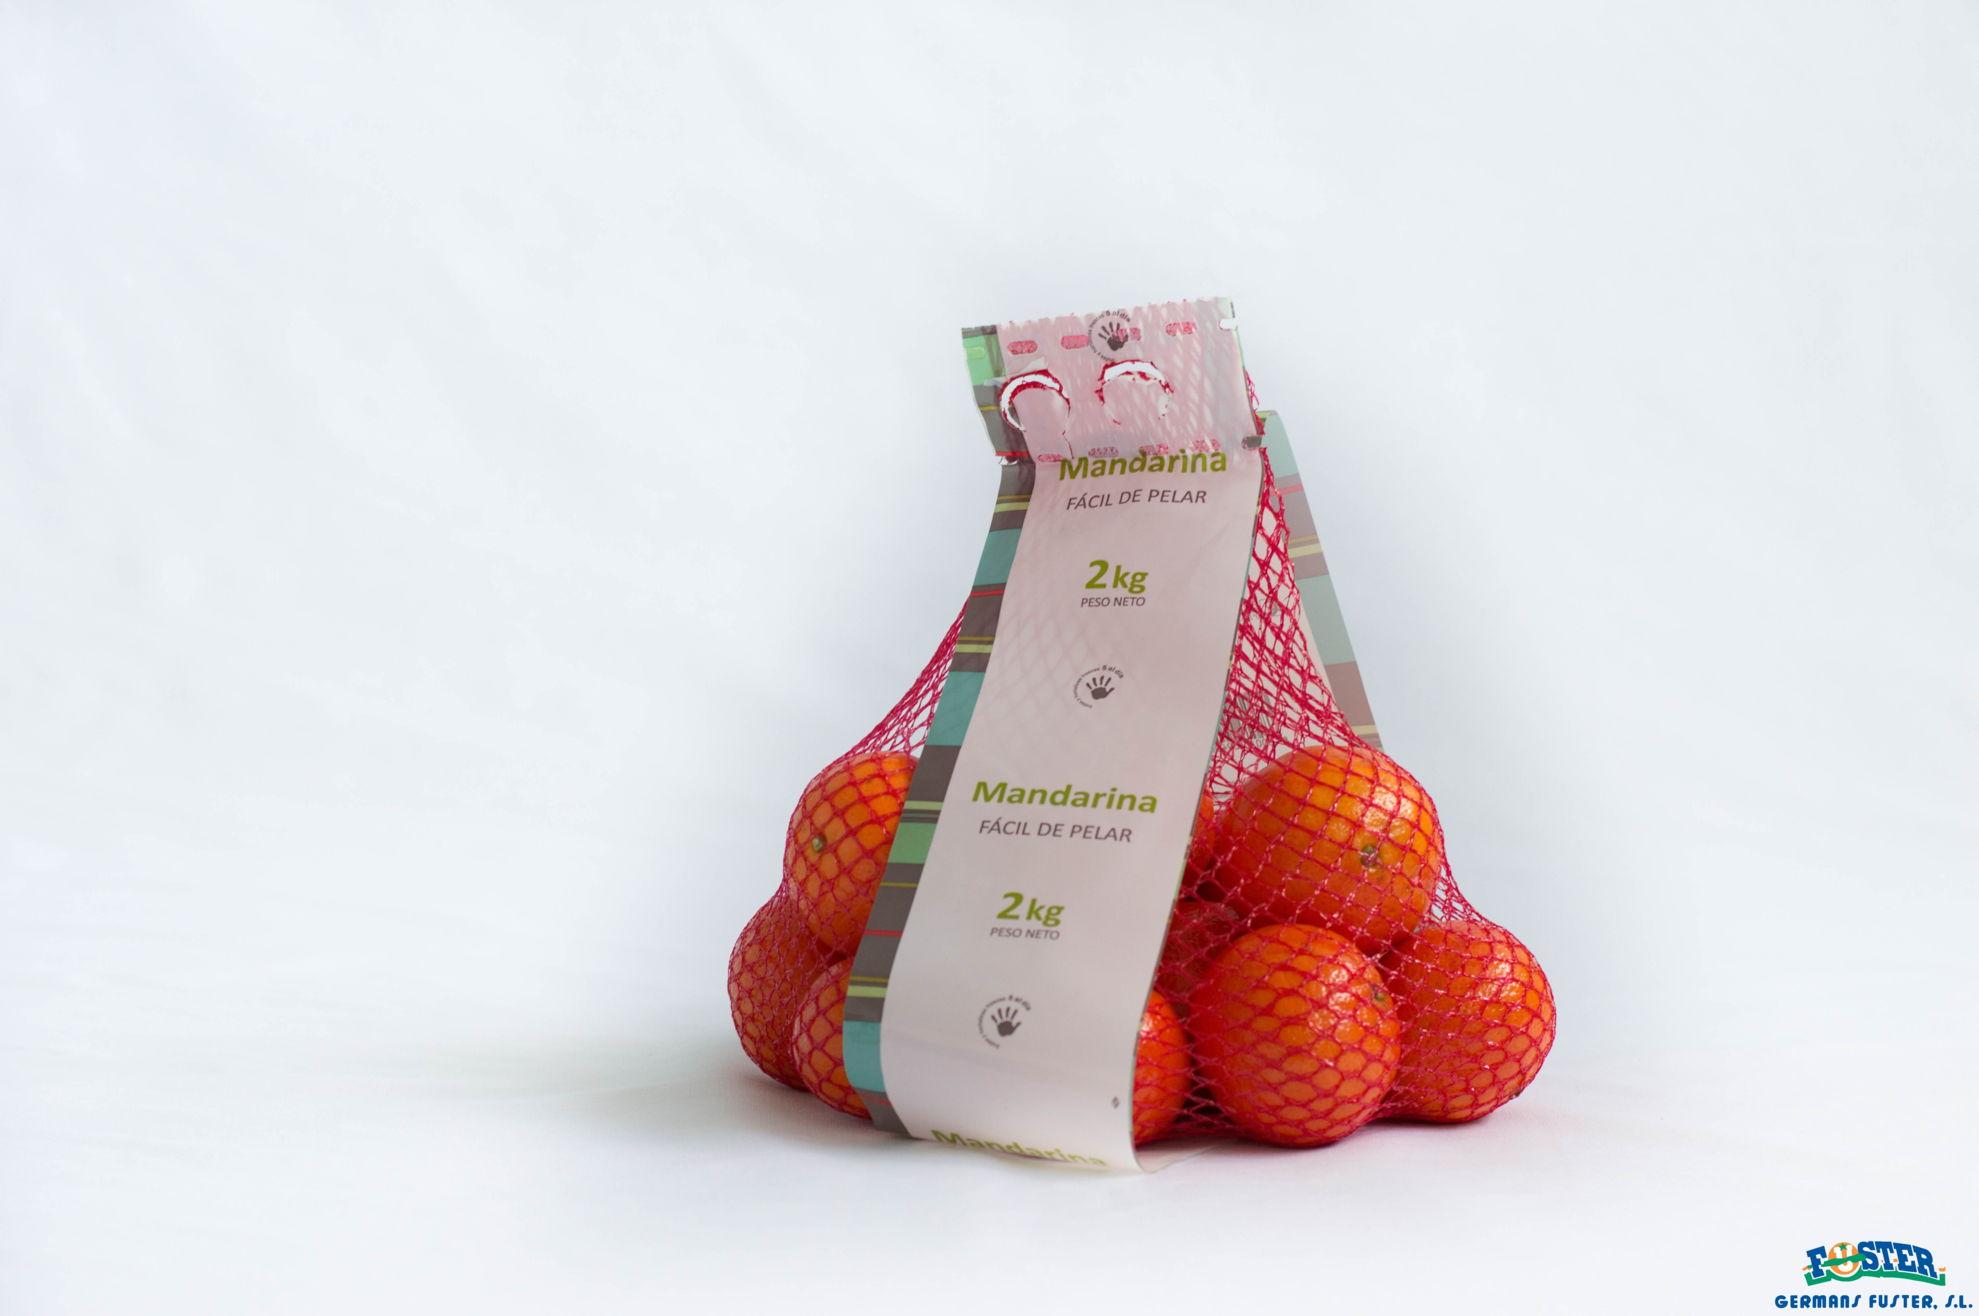 mandarina-malla-germansfuster